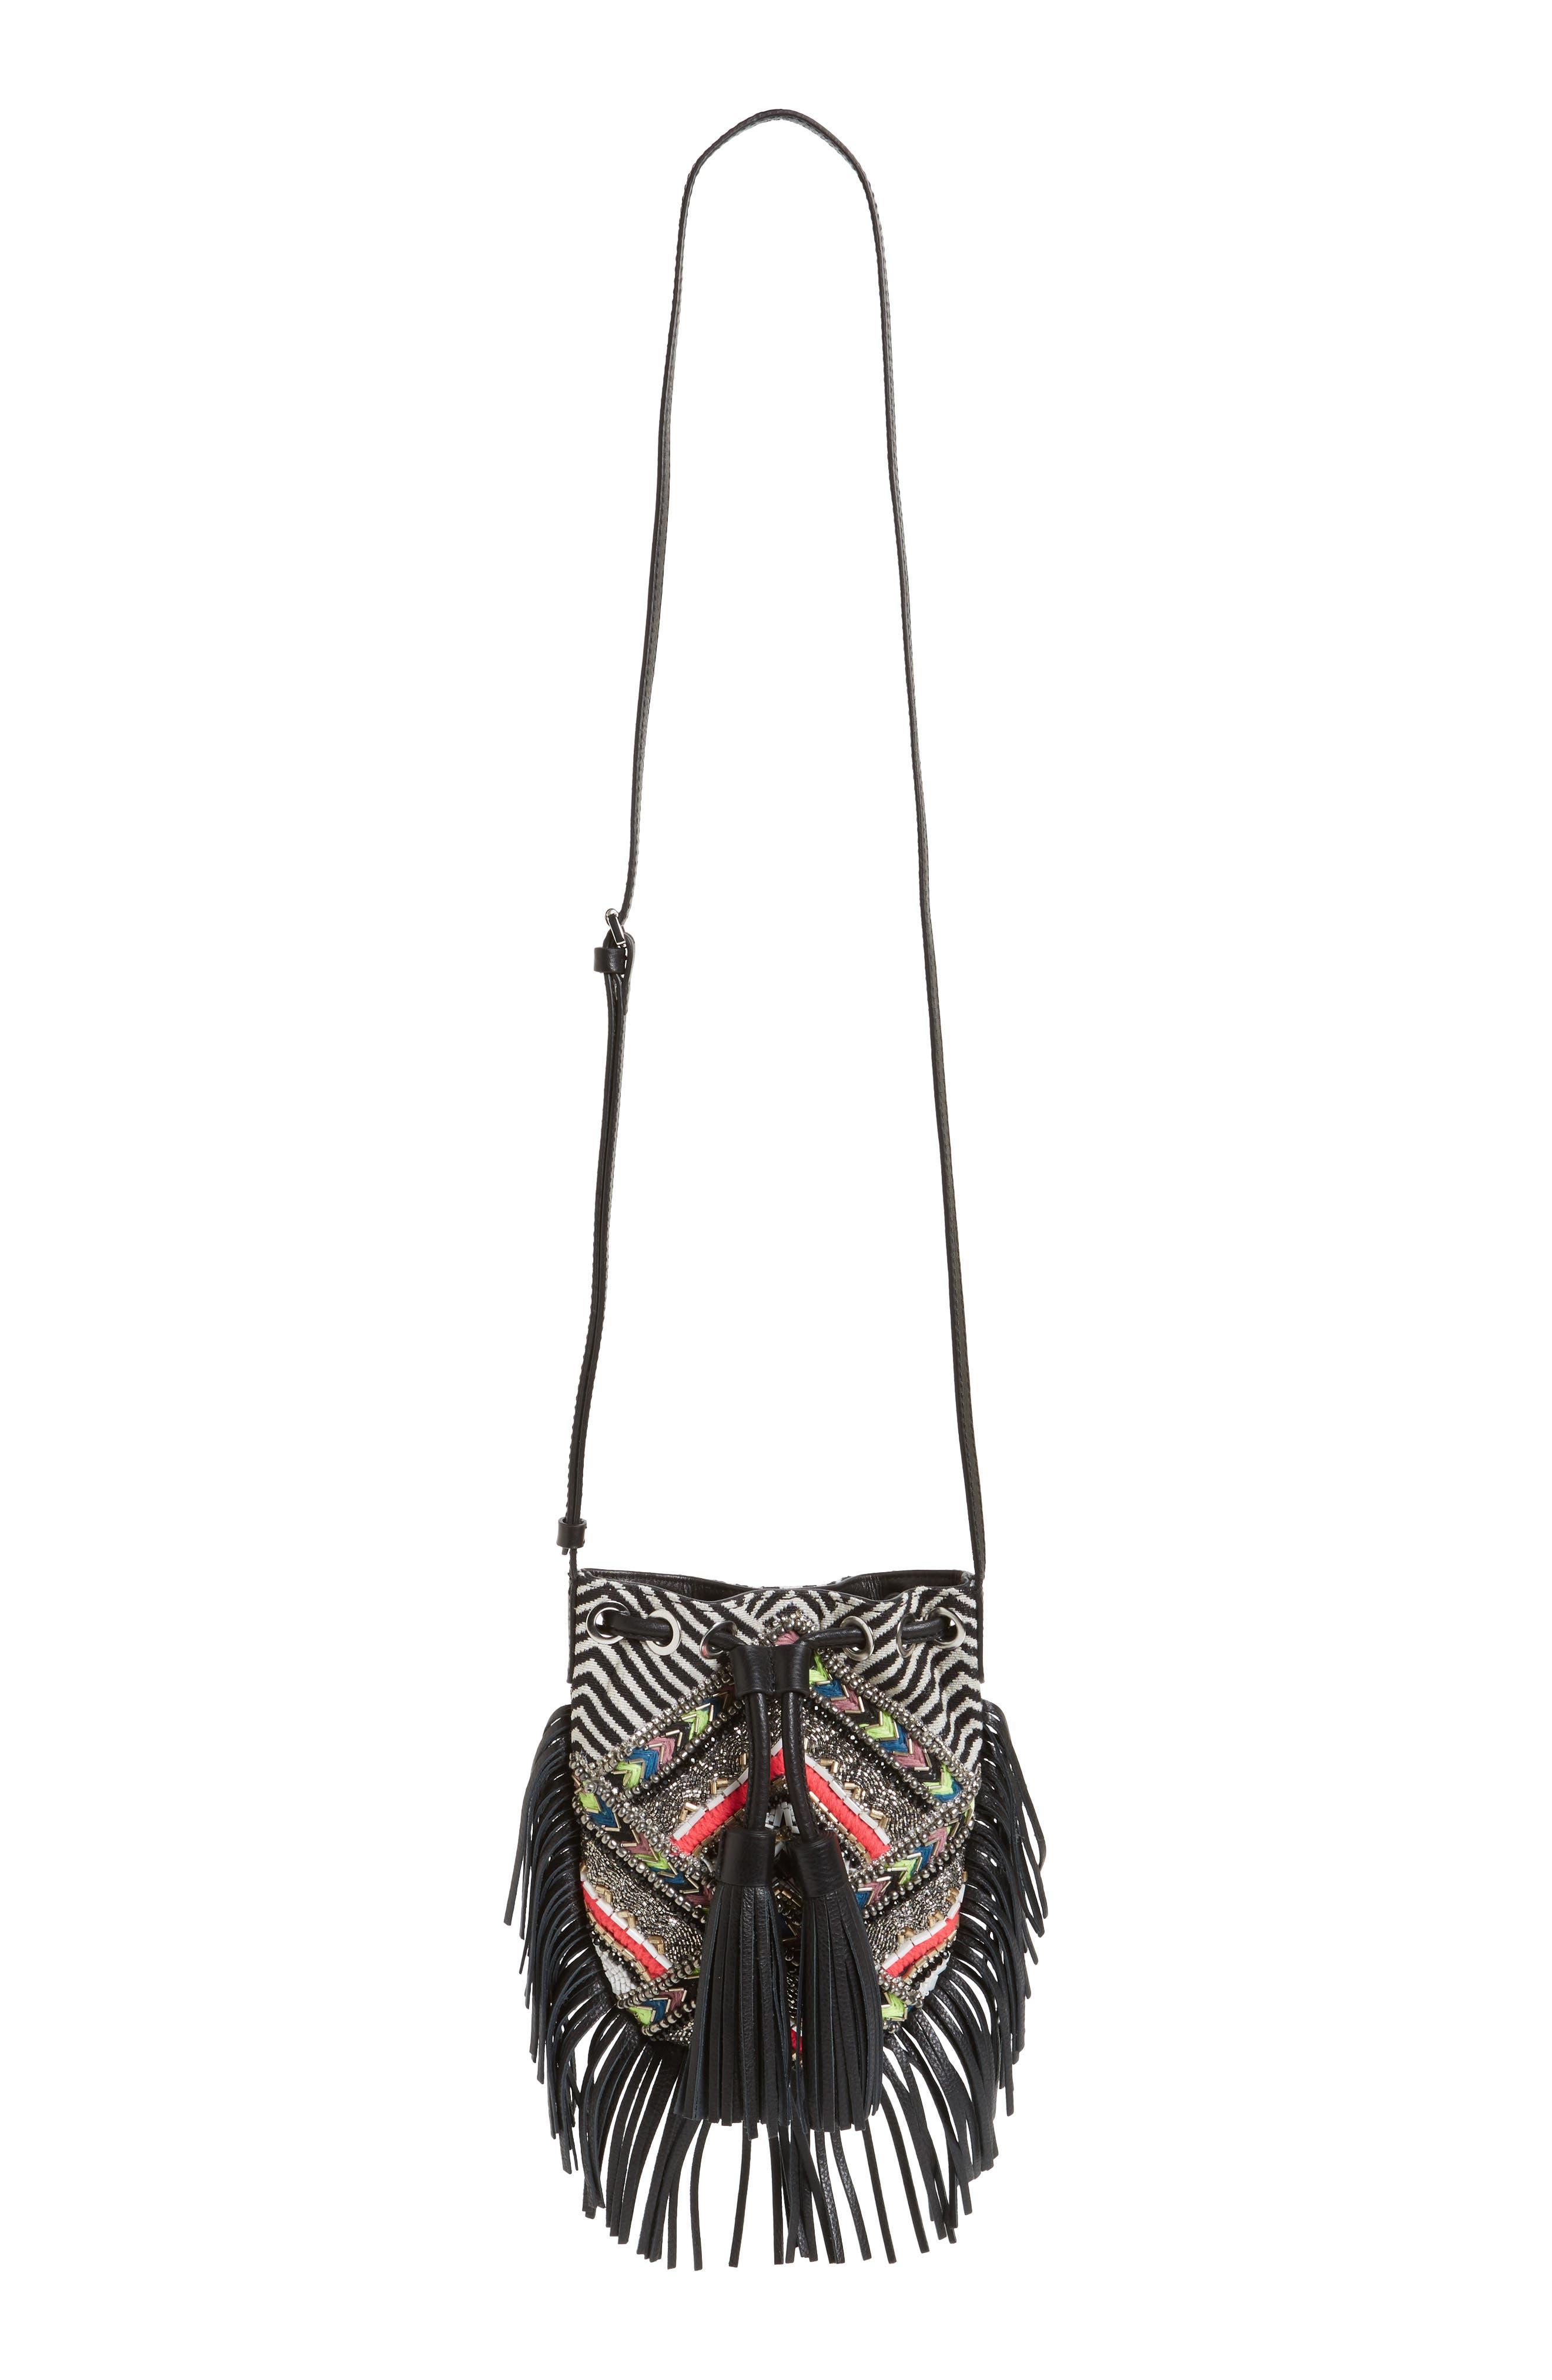 Alternate Image 1 Selected - Rebecca Minkoff Wonder Phone Canvas Crossbody Bag